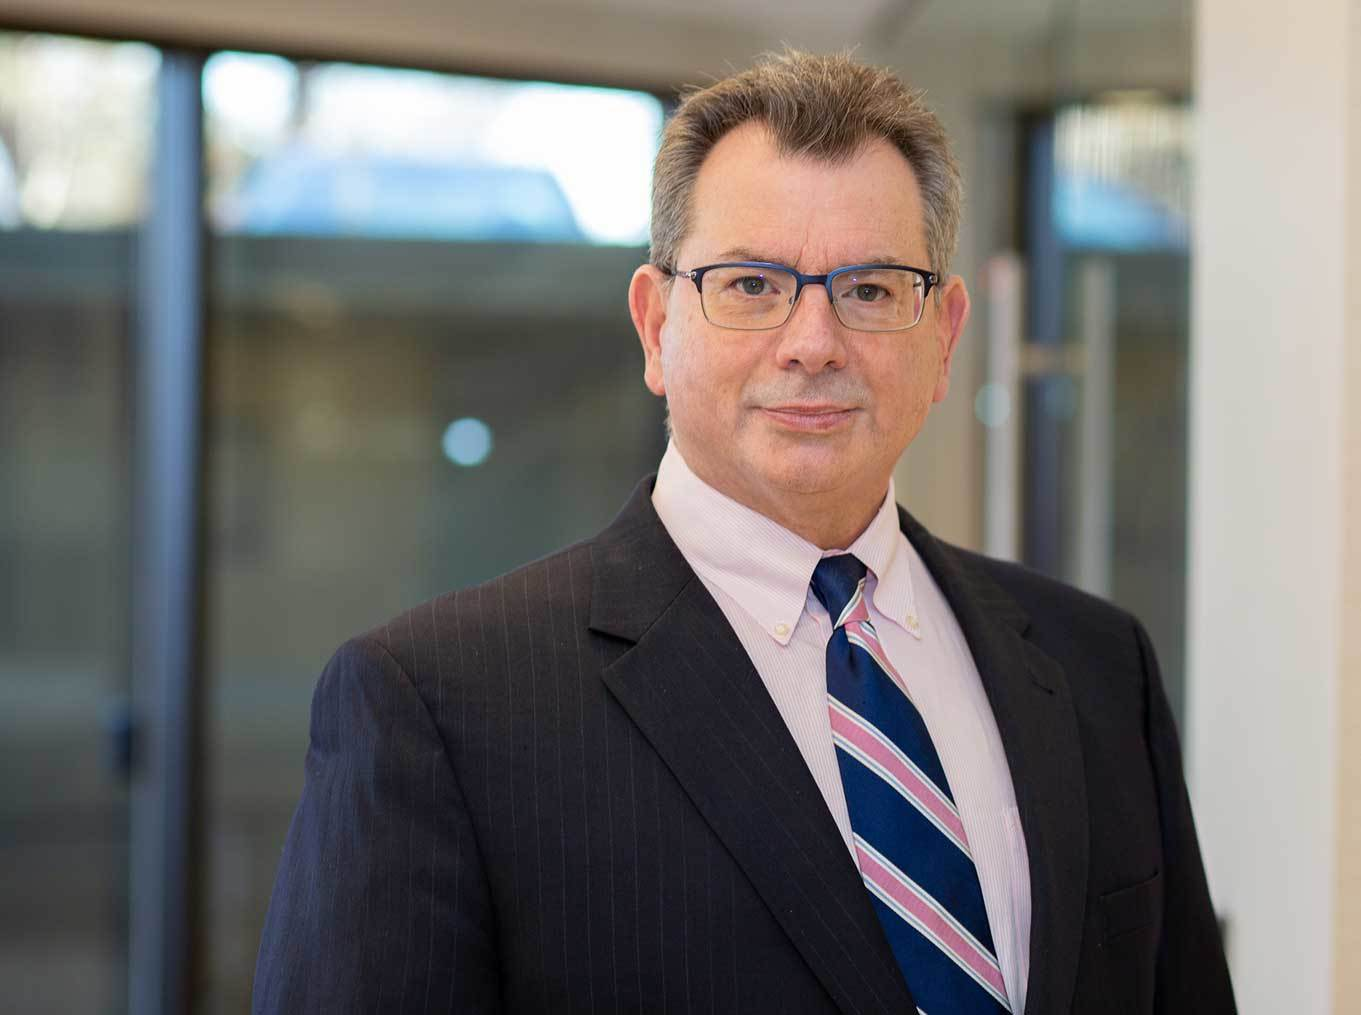 Attorney Client Discussions Shielded Under Michigan Whistleblower